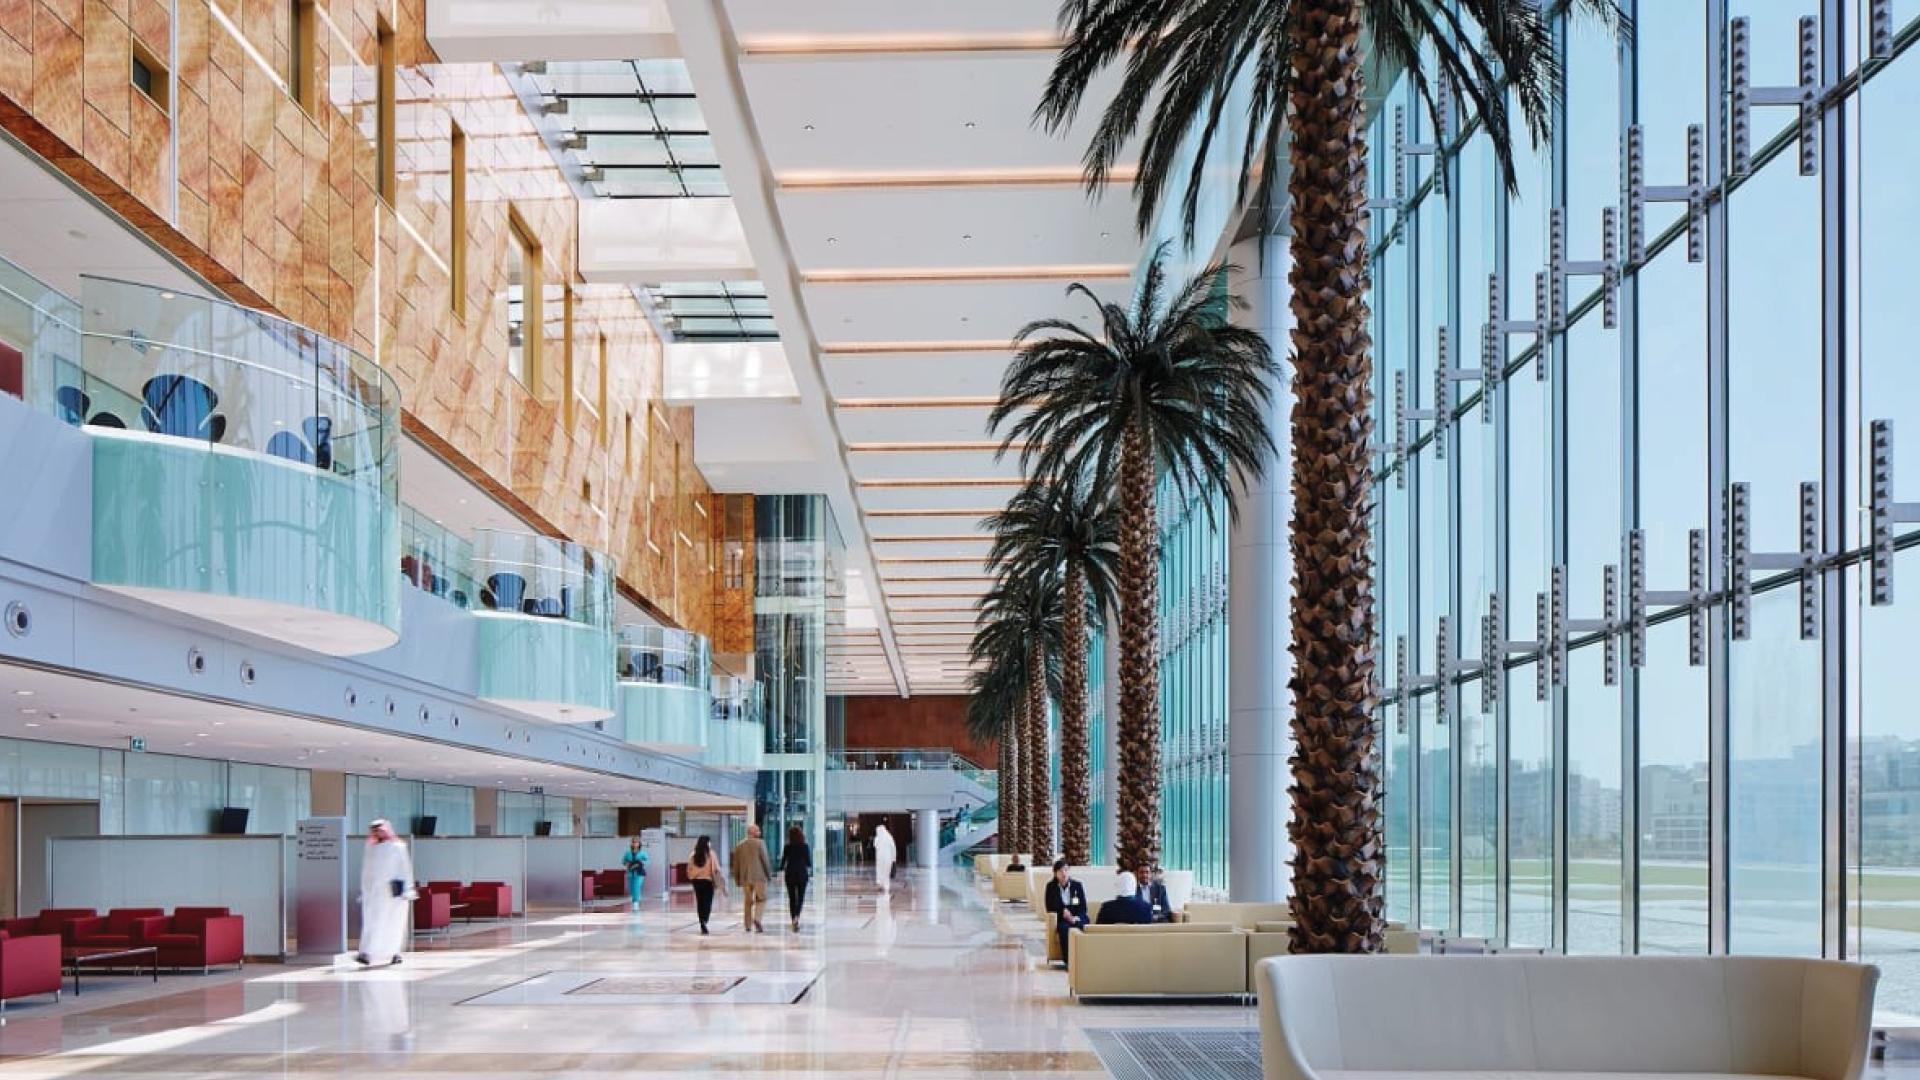 Cleveland Clinic Abu Dhabi 5.jpg